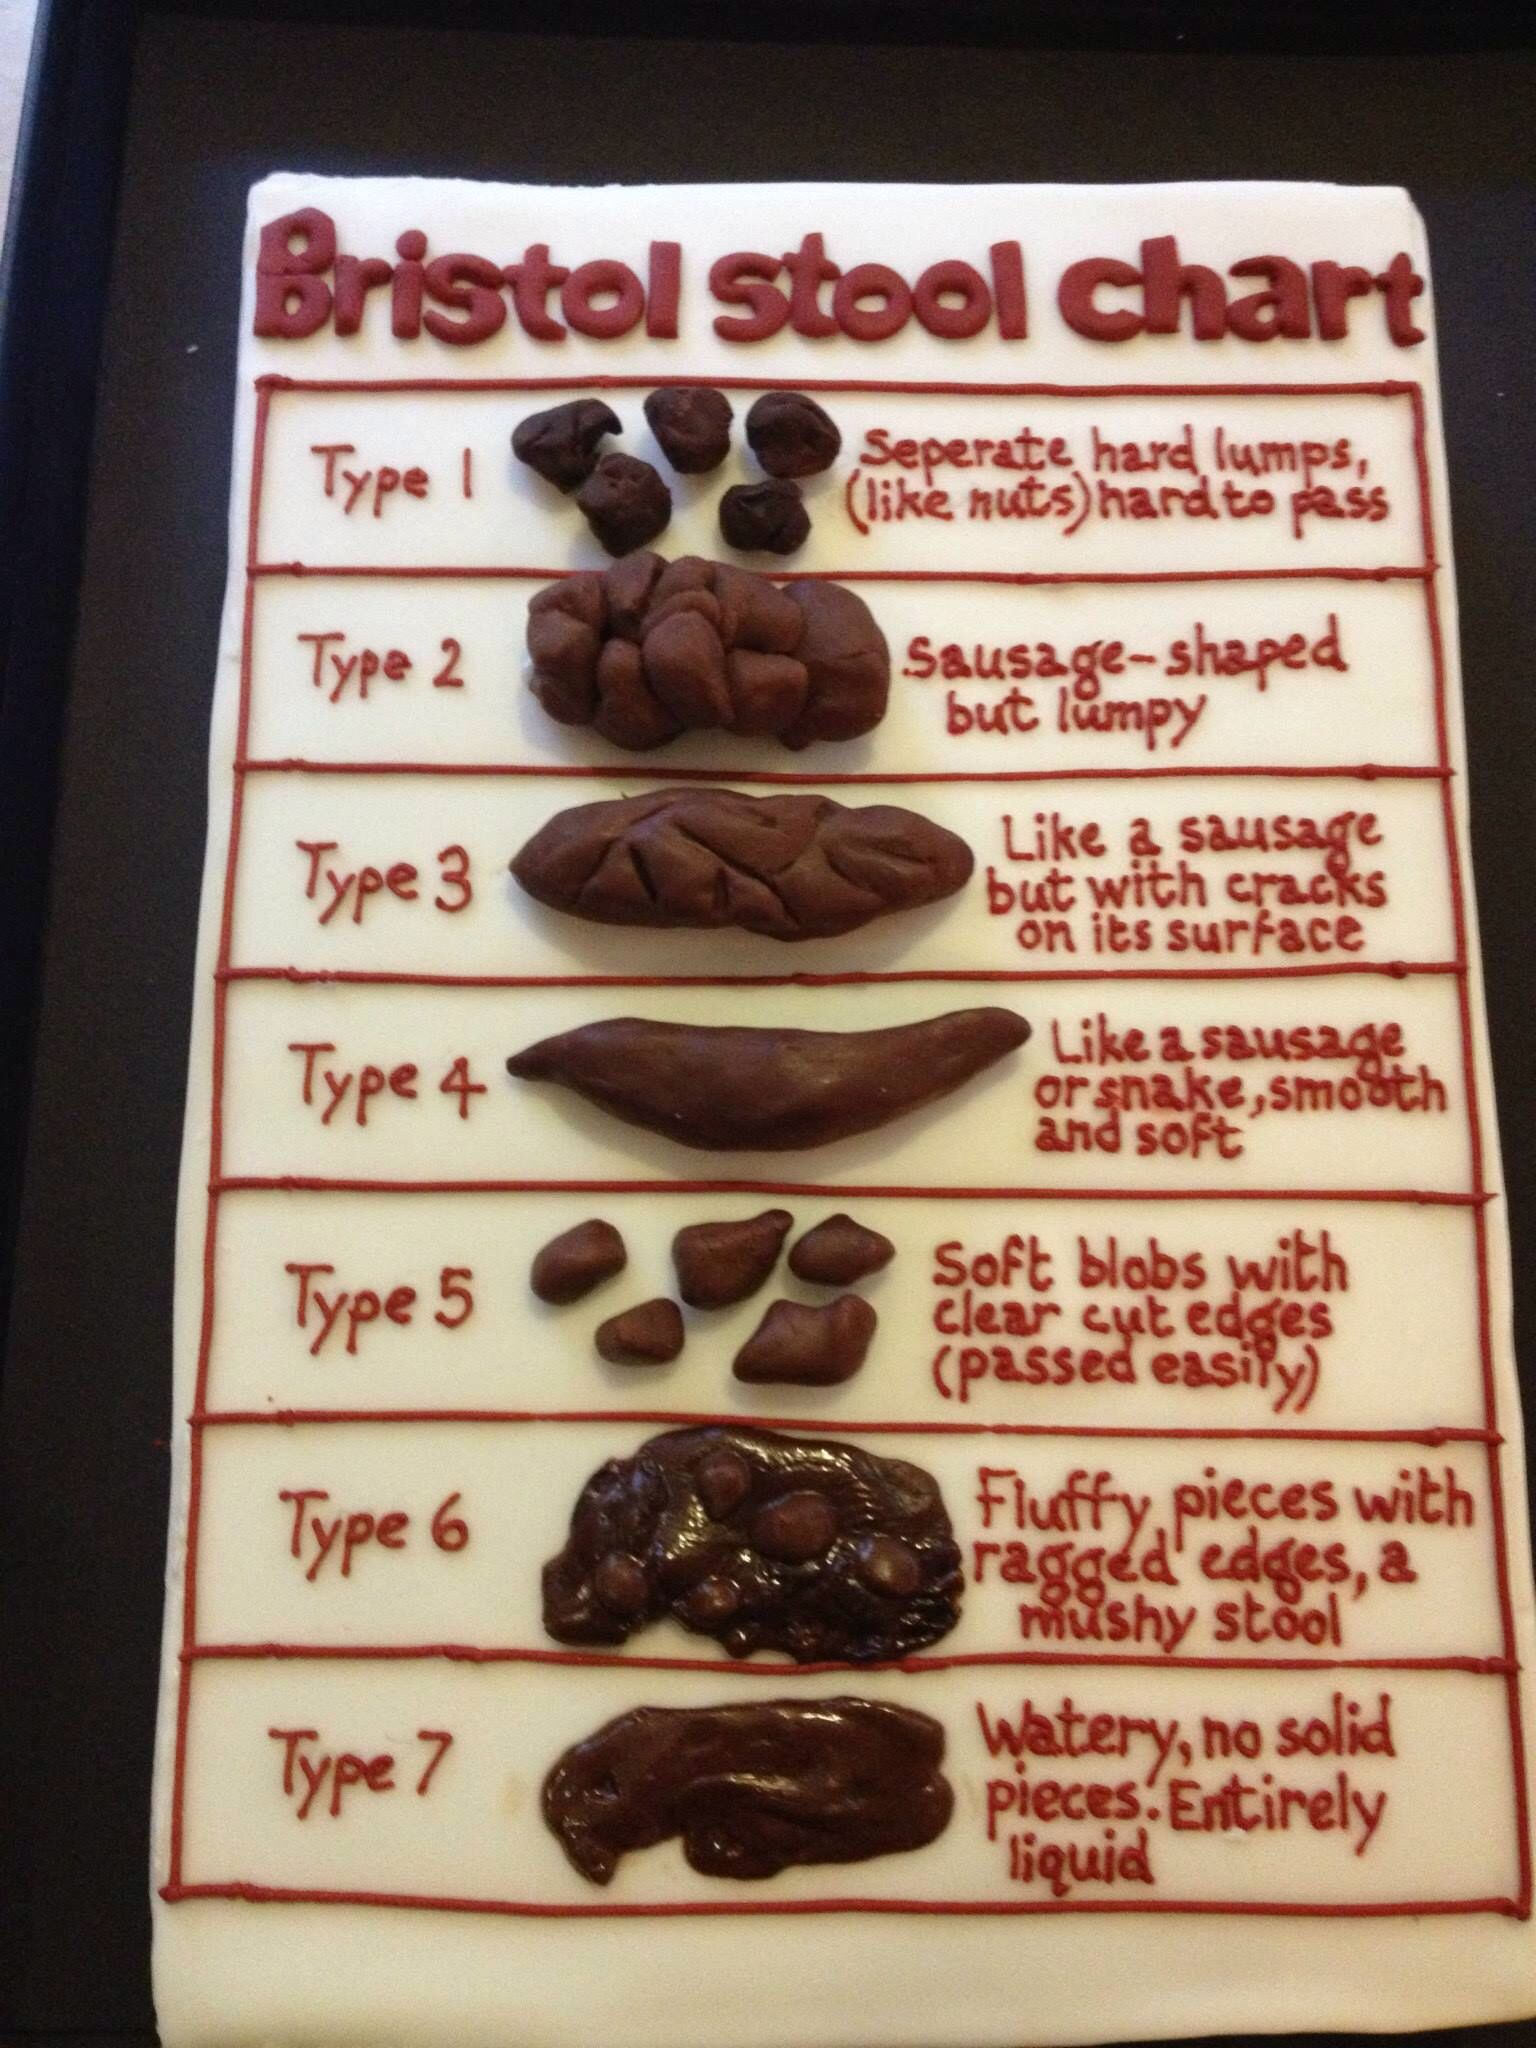 Bristol Stool Chart Chocolate Cake